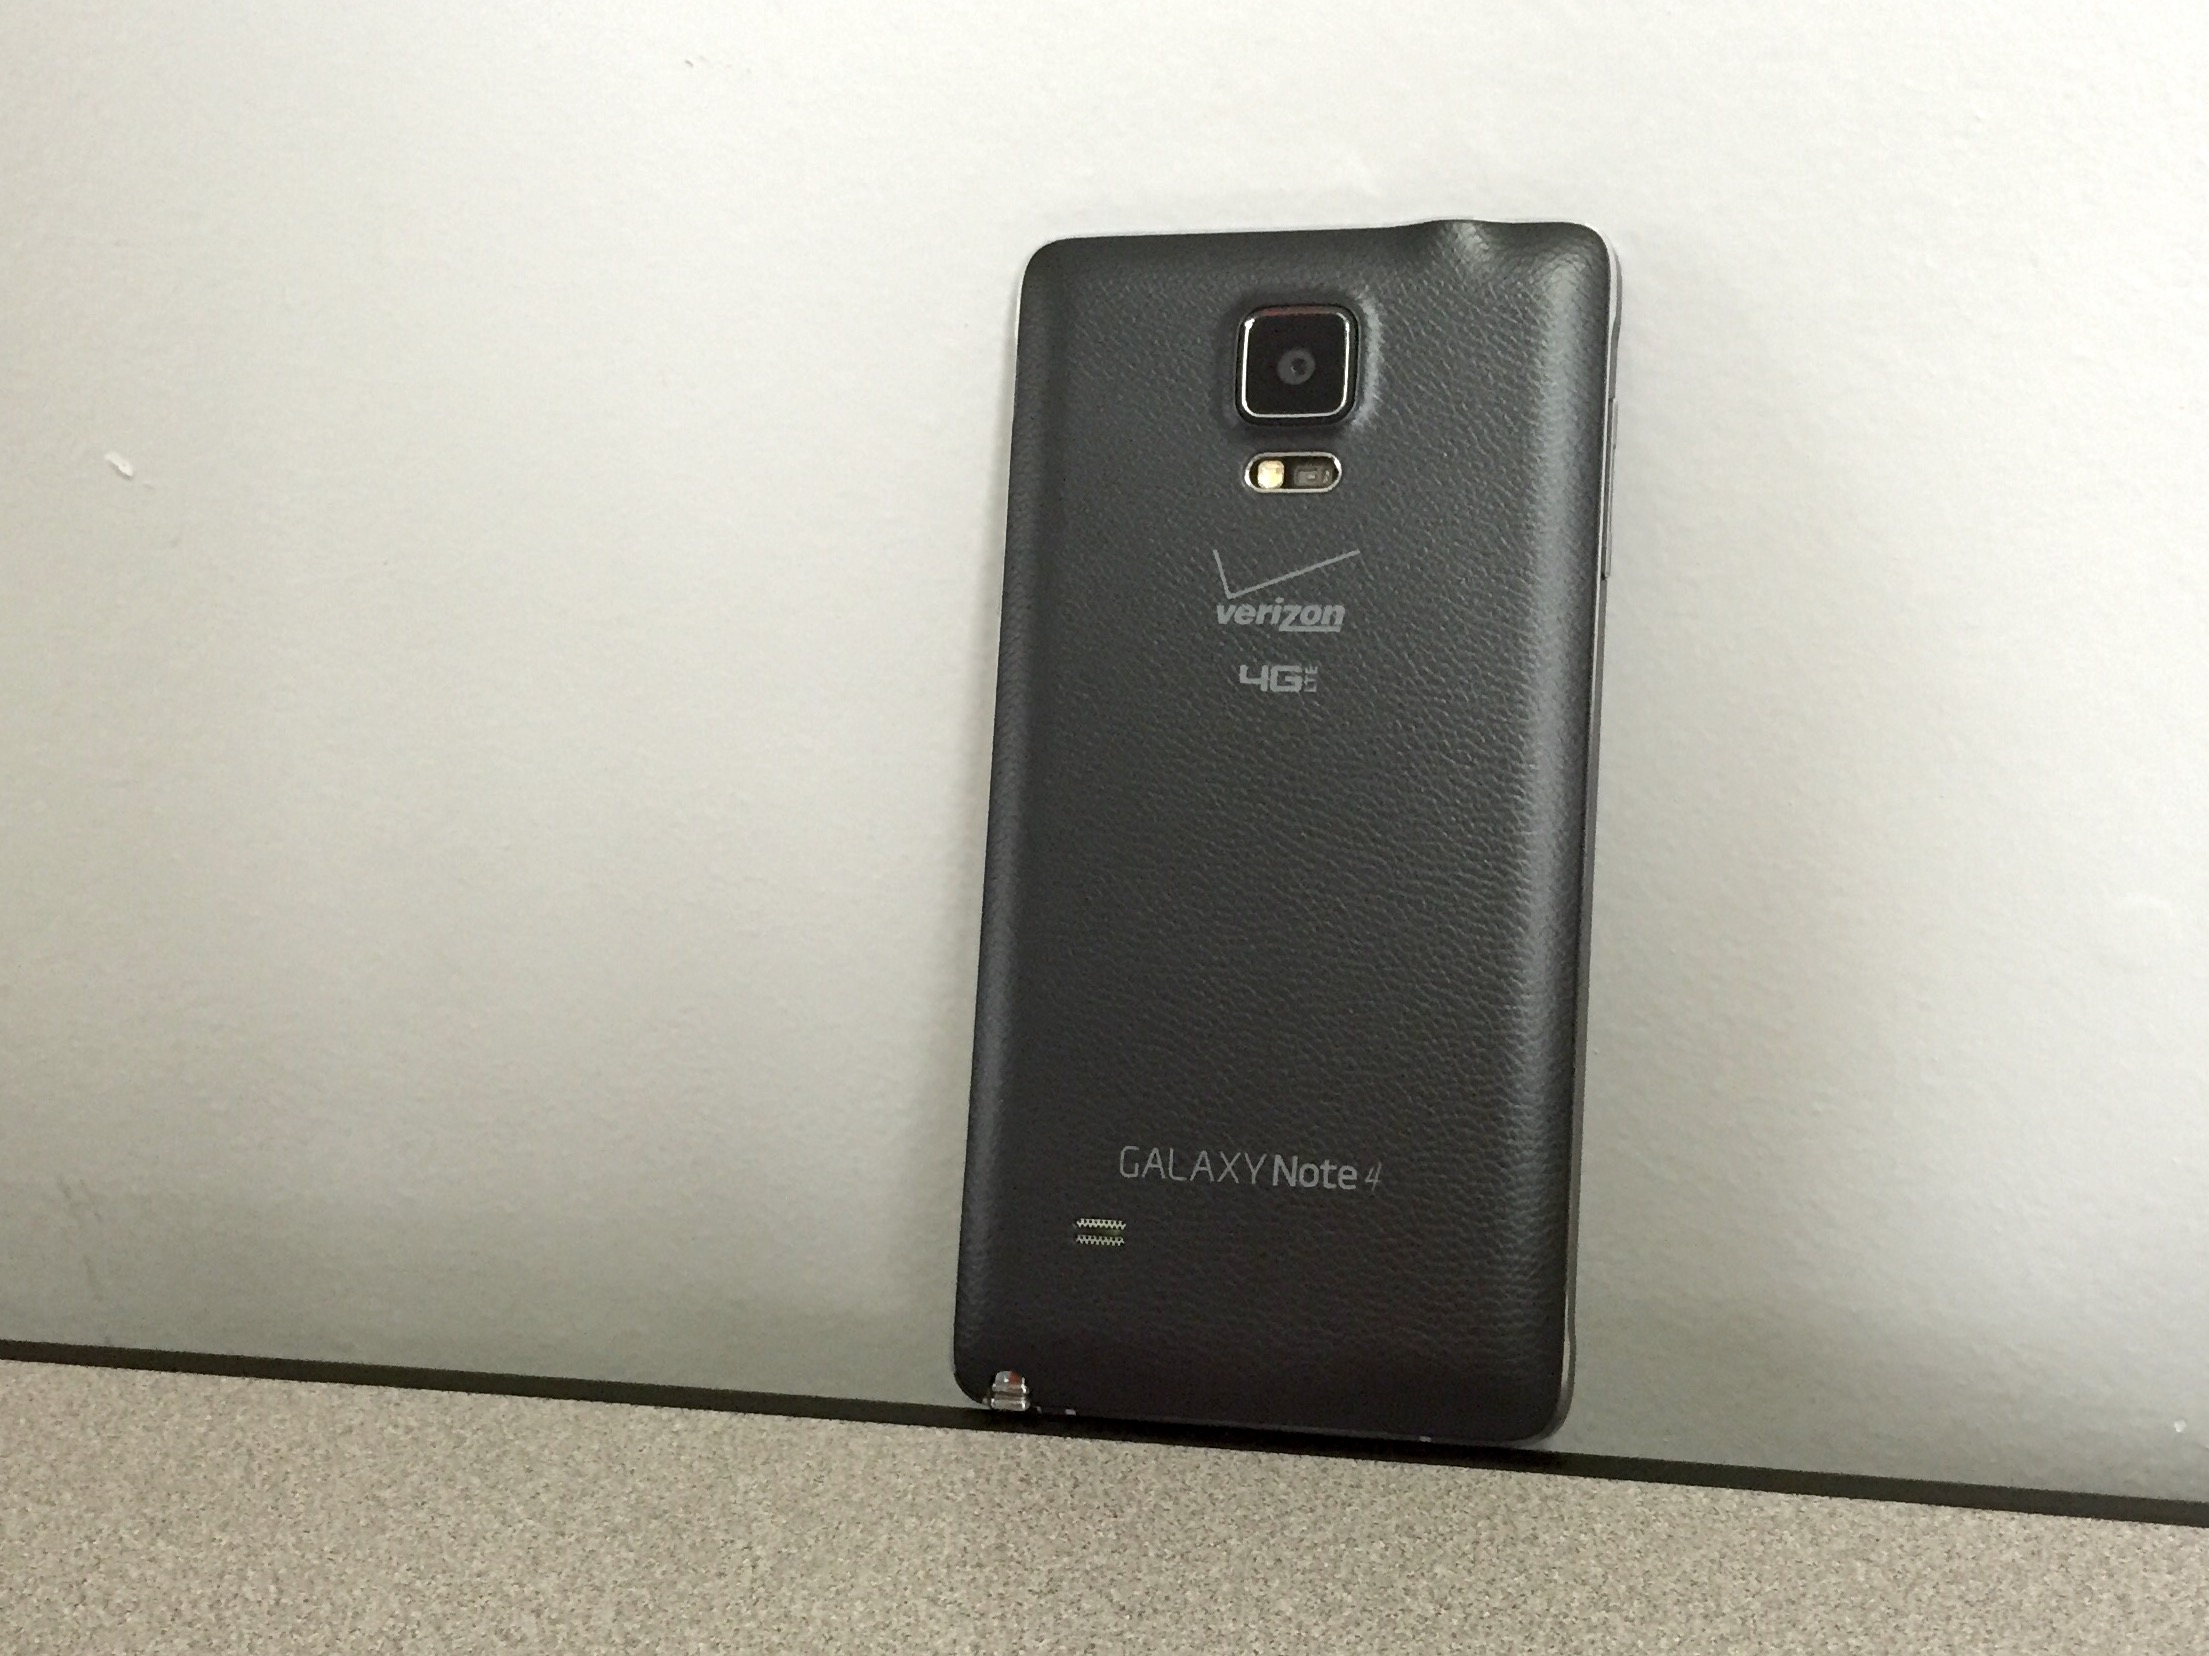 Verizon Galaxy Note 4 Lollipop Update Review - 1